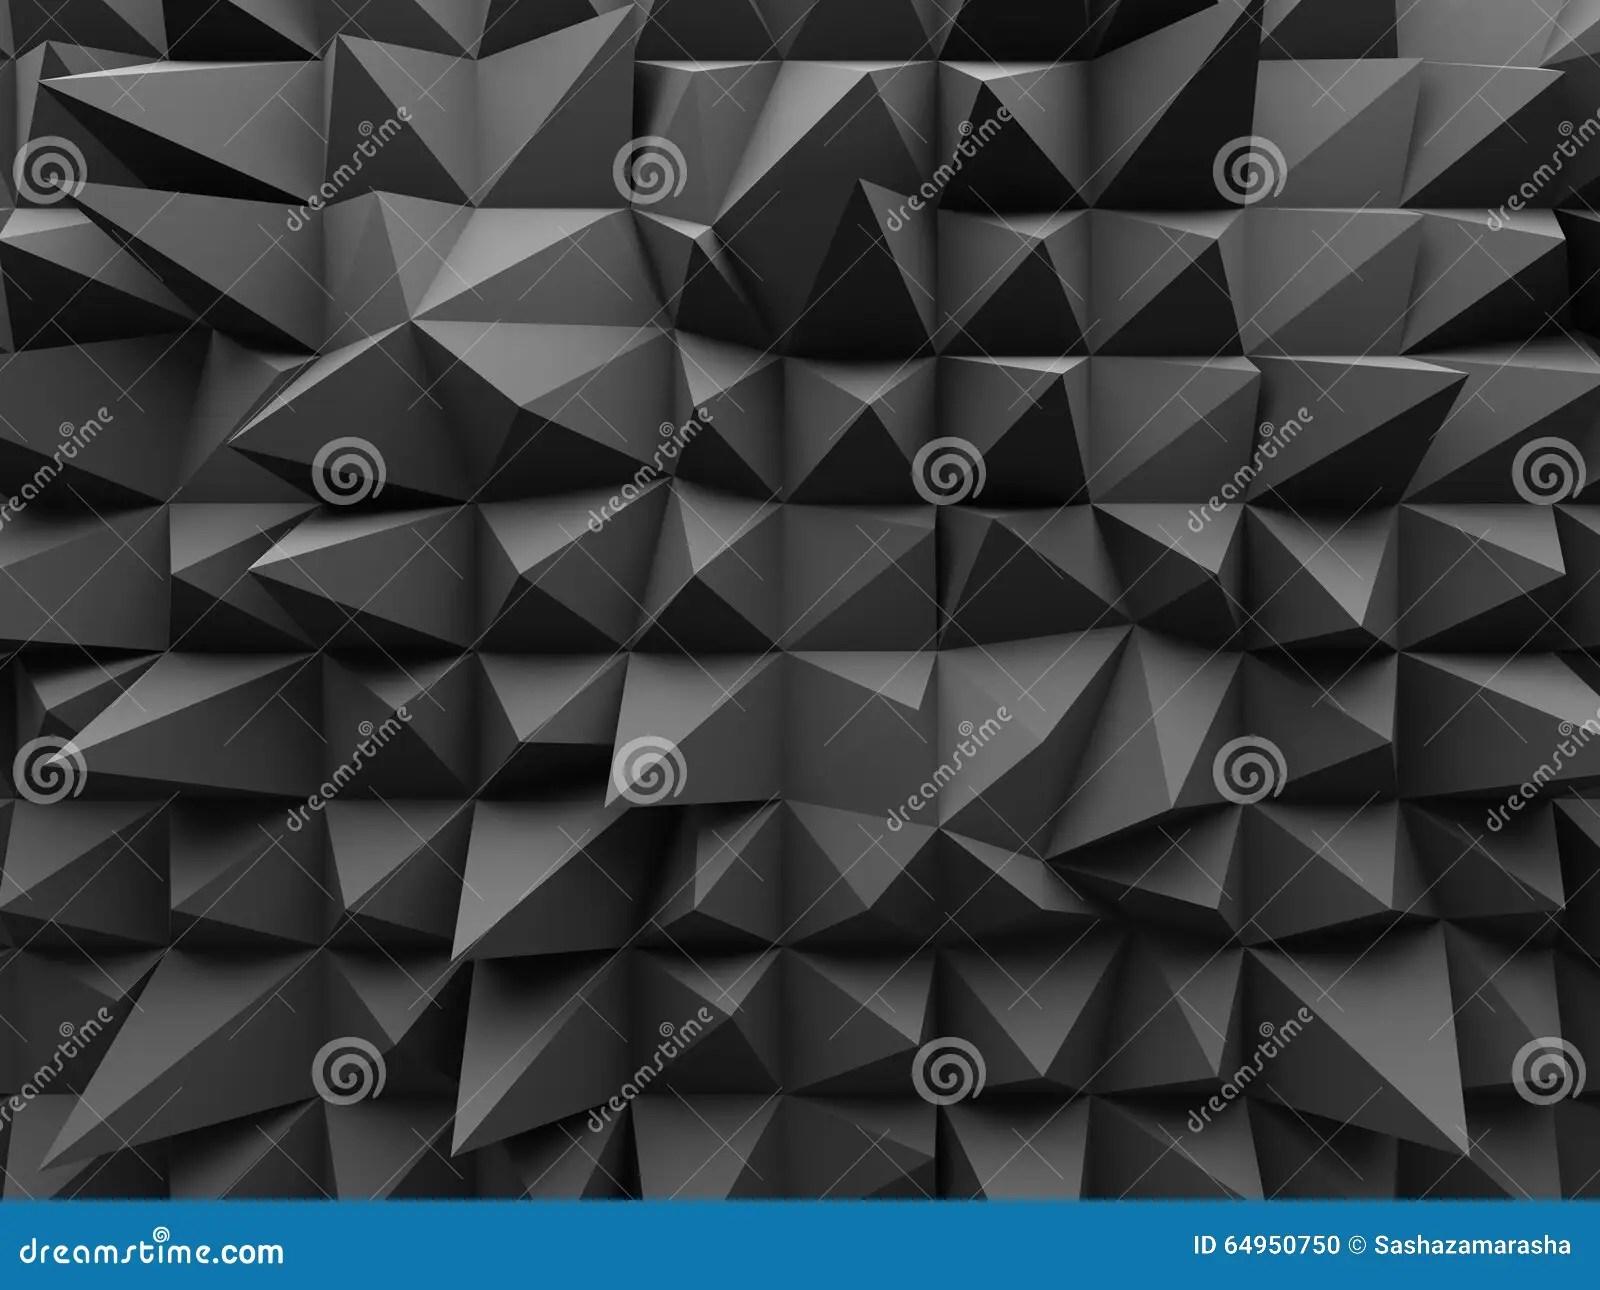 abstract geometric dark 3d